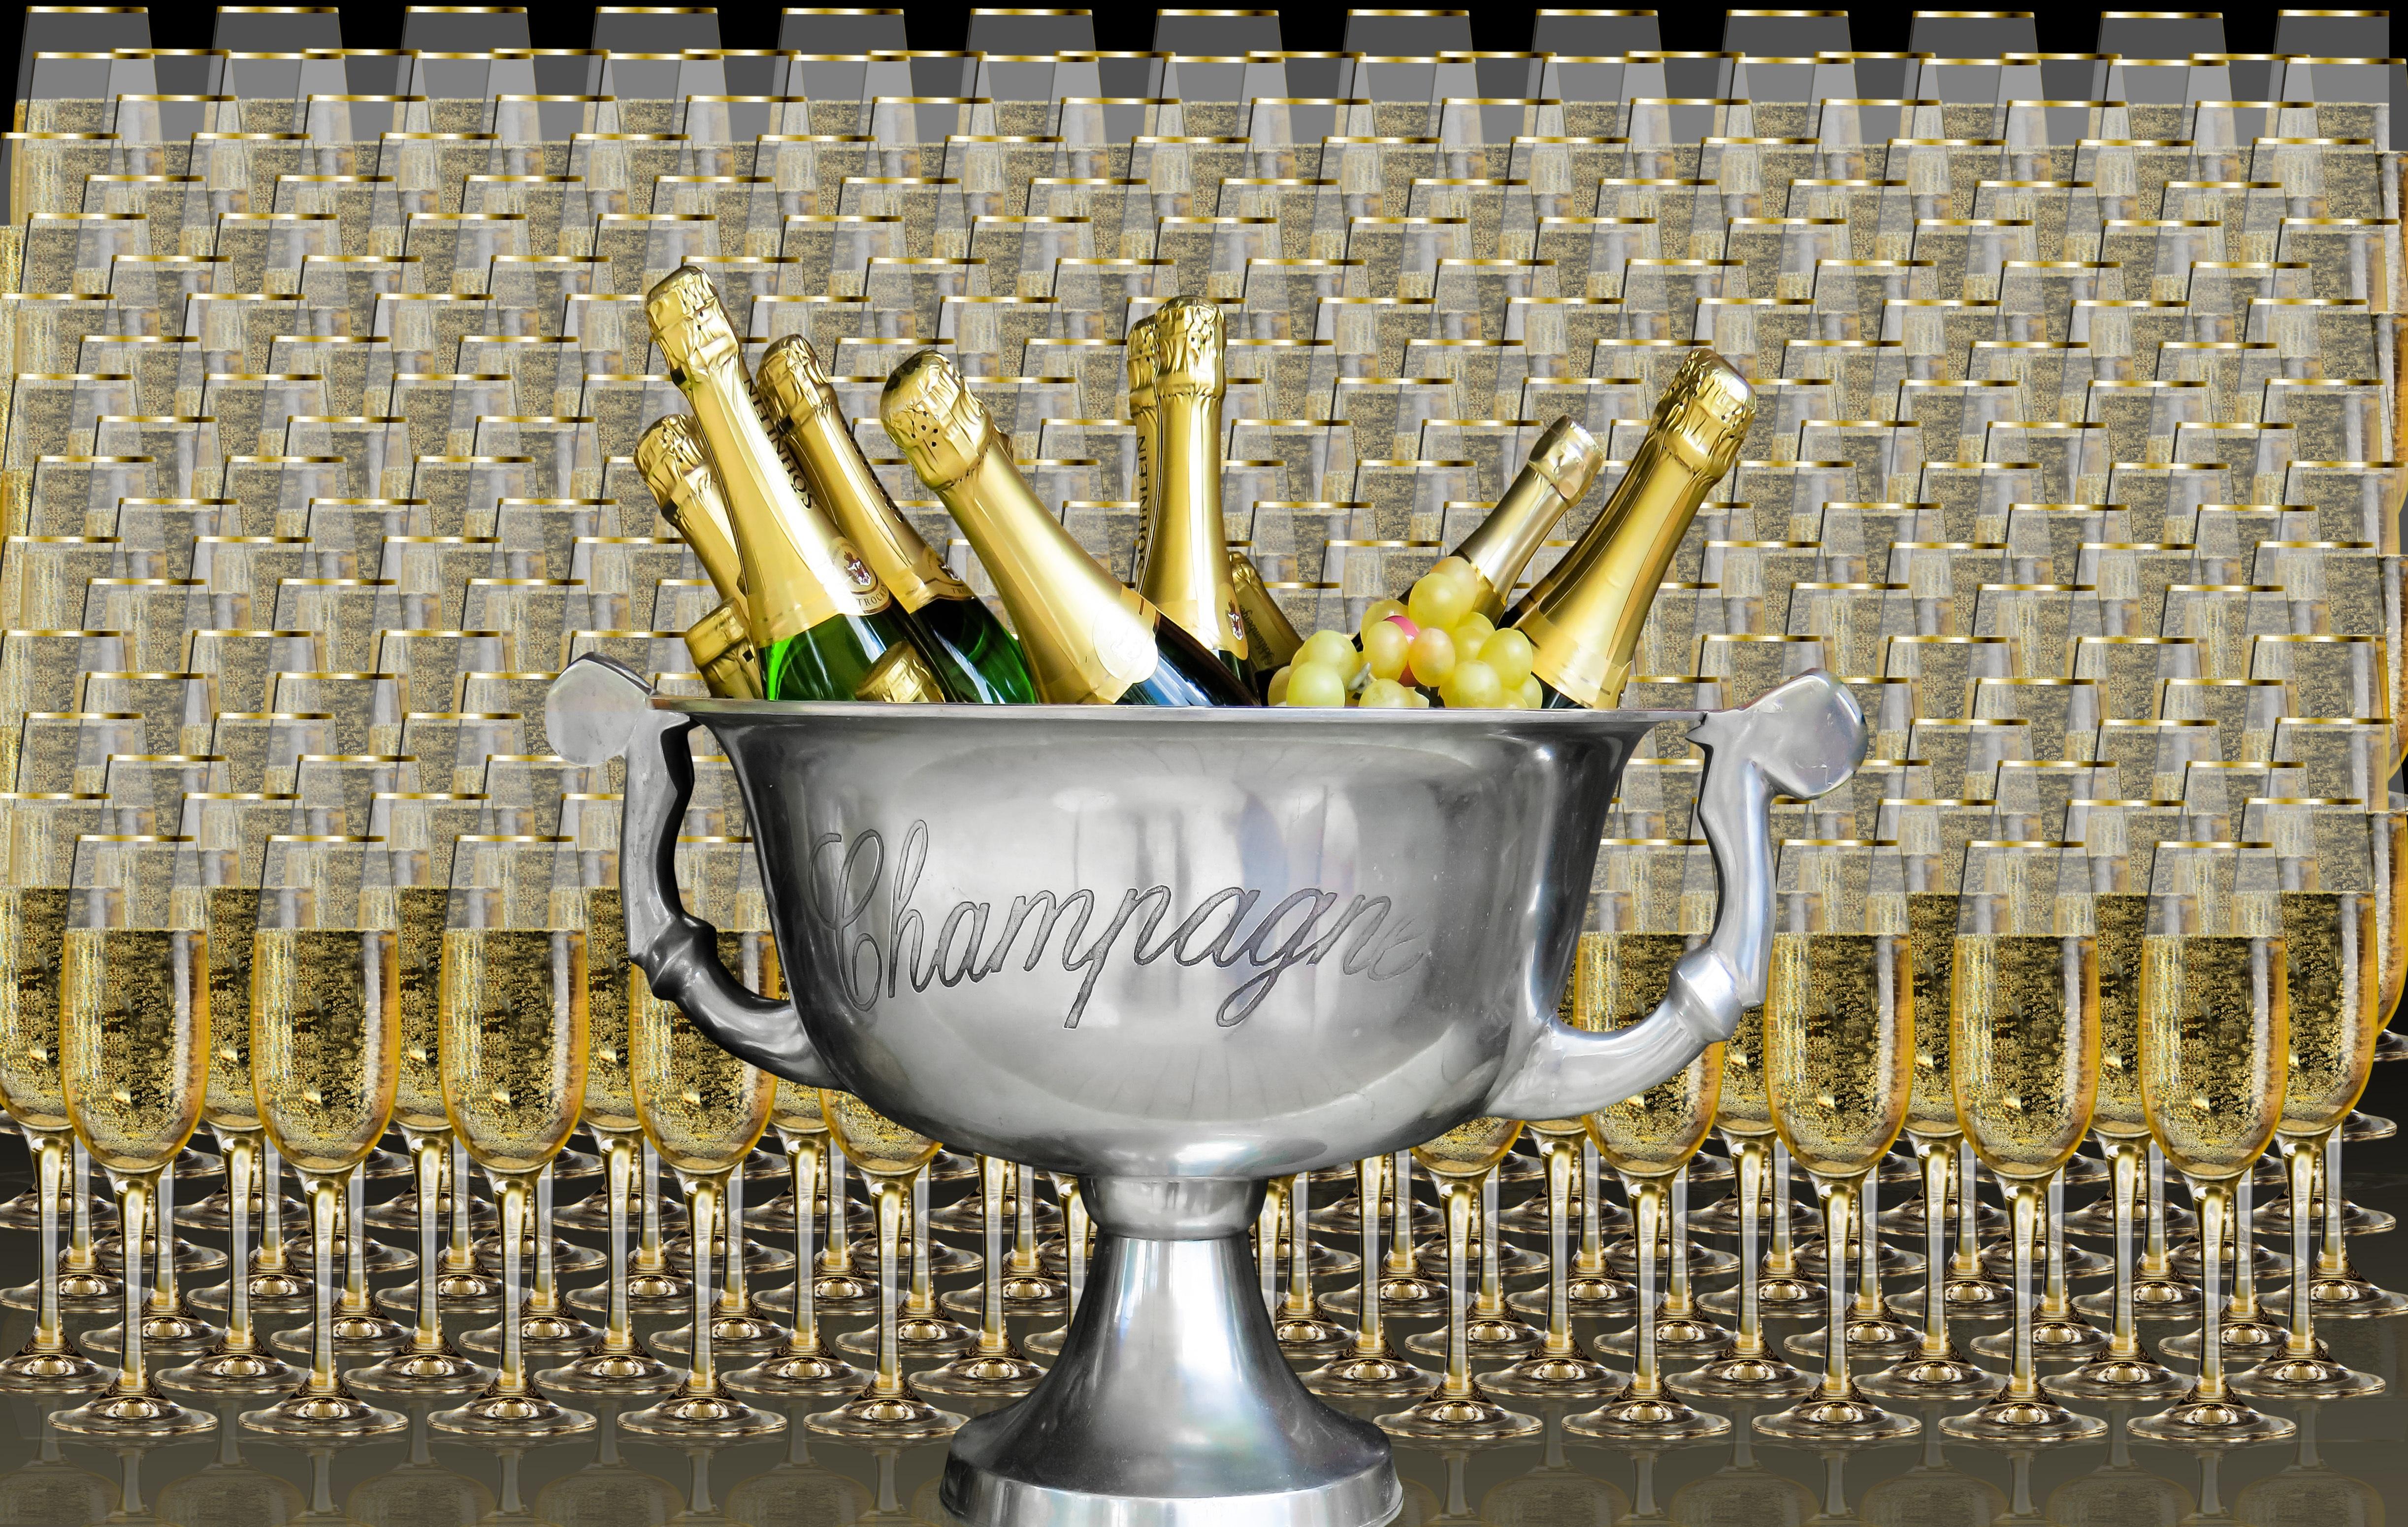 gratis afbeeldingen drinken champagne vieren bril. Black Bedroom Furniture Sets. Home Design Ideas